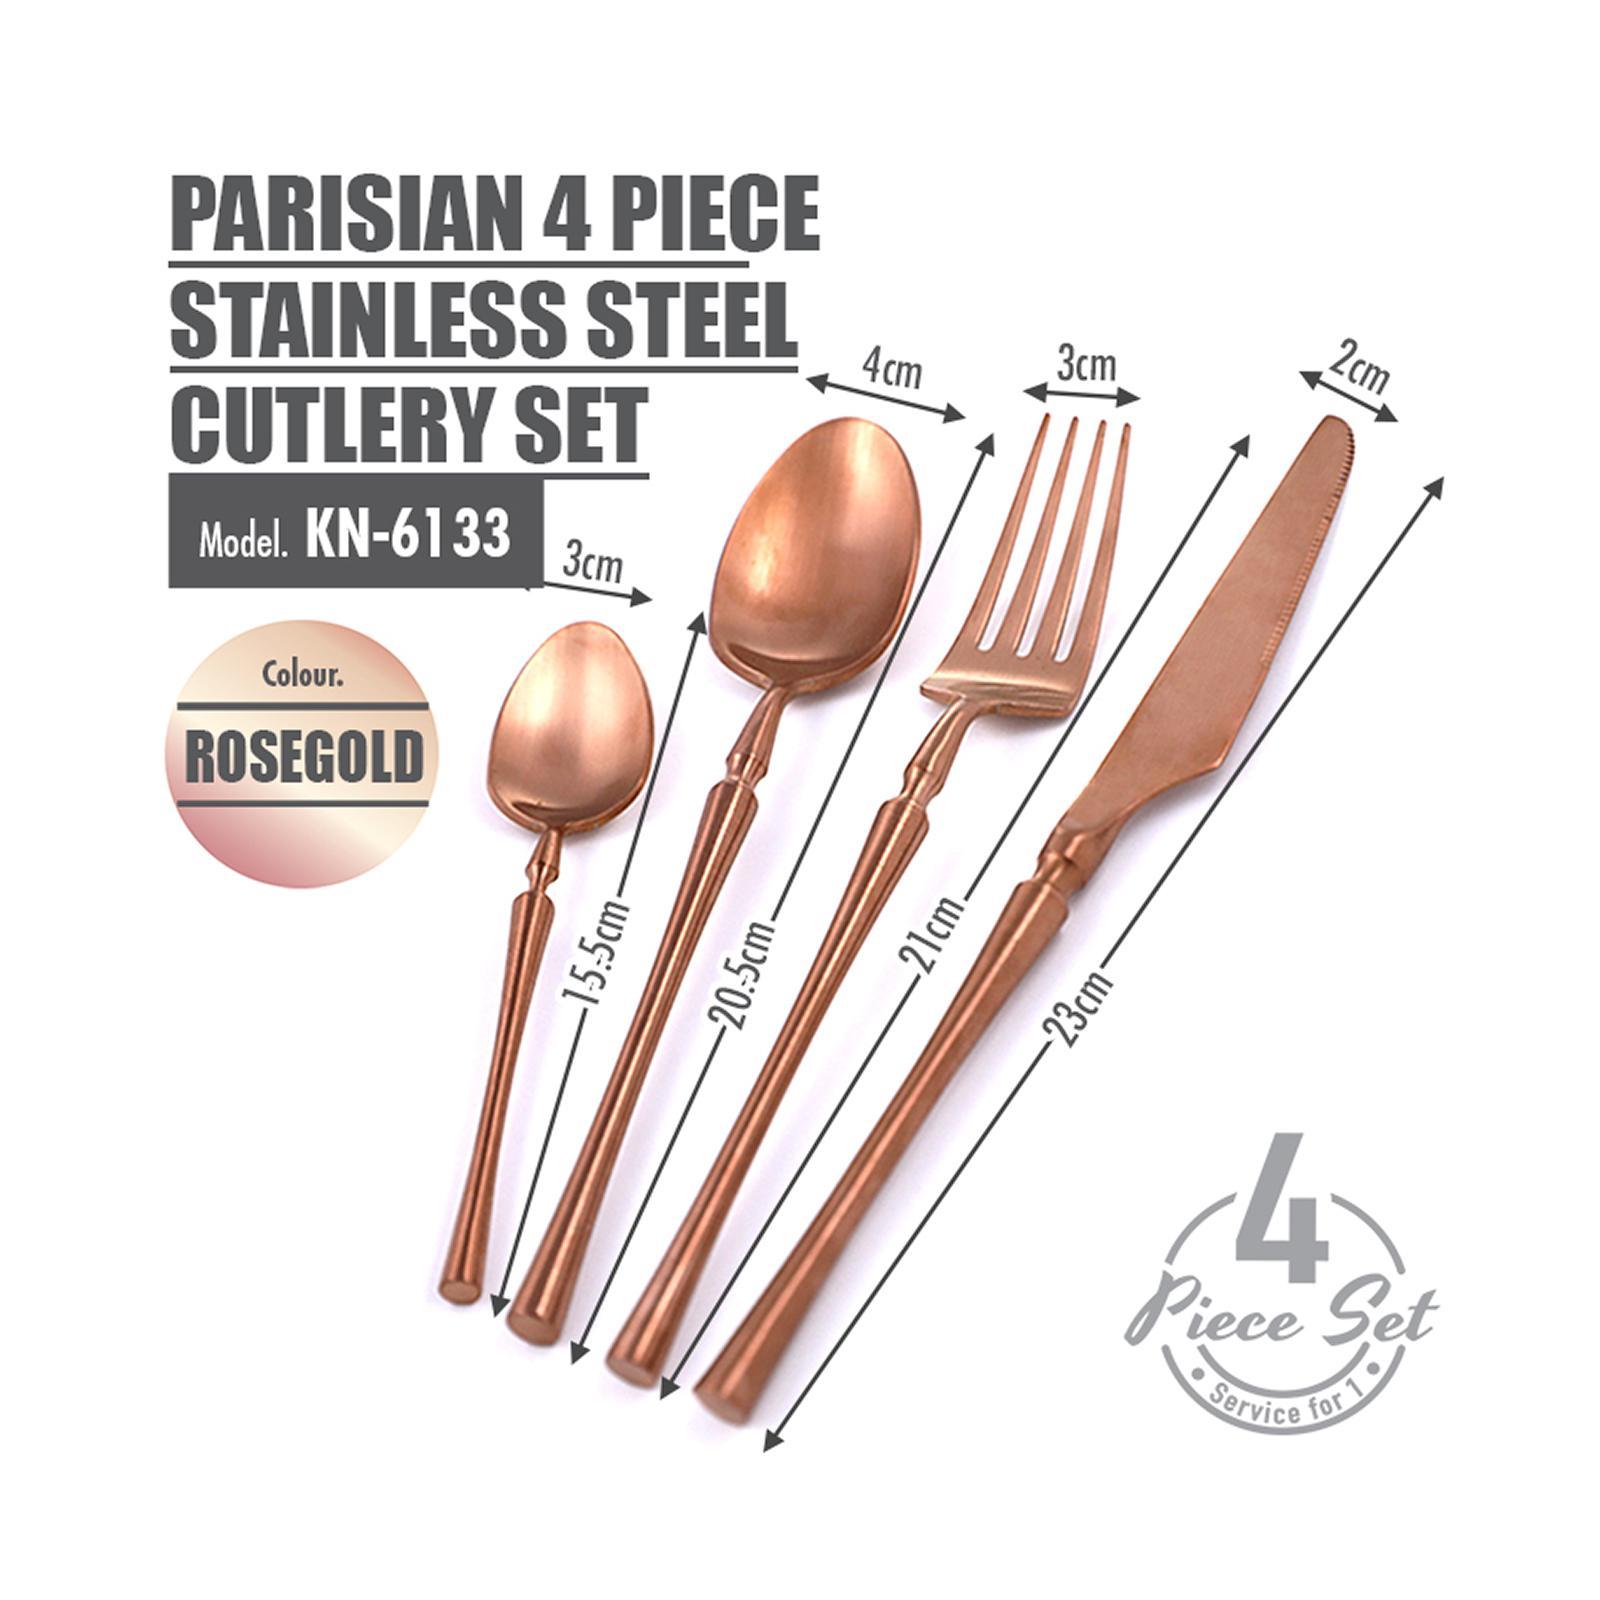 HOUZE Parisian 4 Piece Stainless Steel Cutlery Set (Rose Gold)